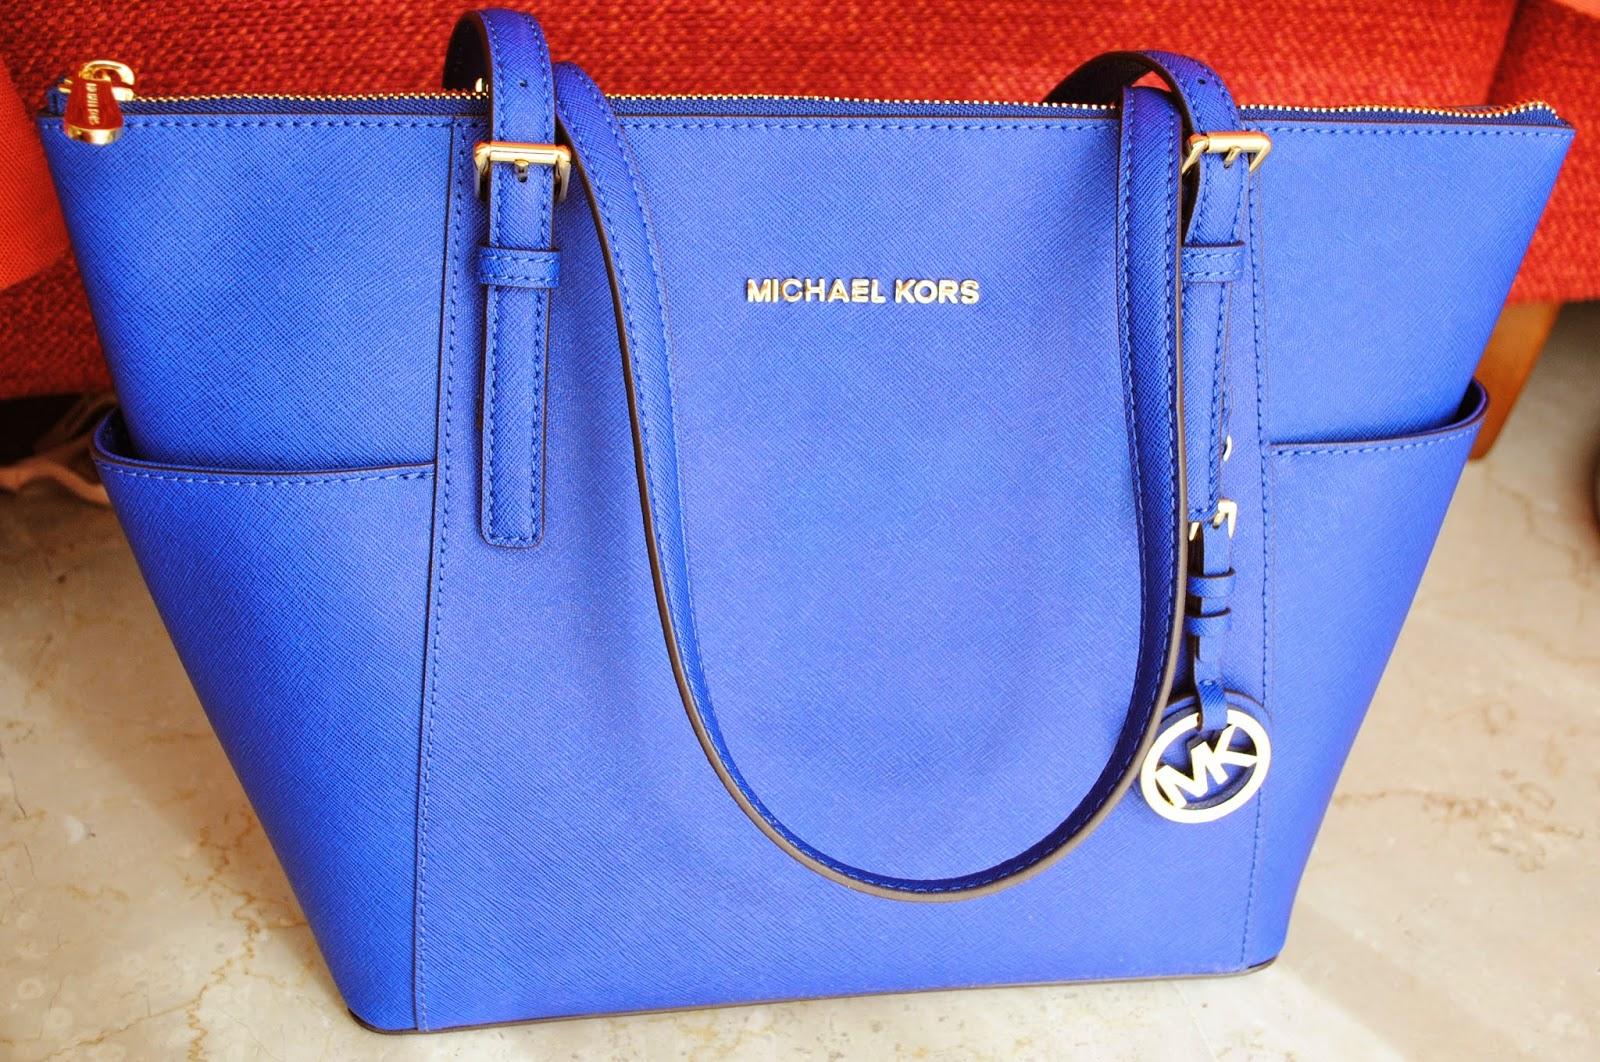 Michael Kors Jet Set Top-Zip saffiano tote blu sapphire  e9251fd75de